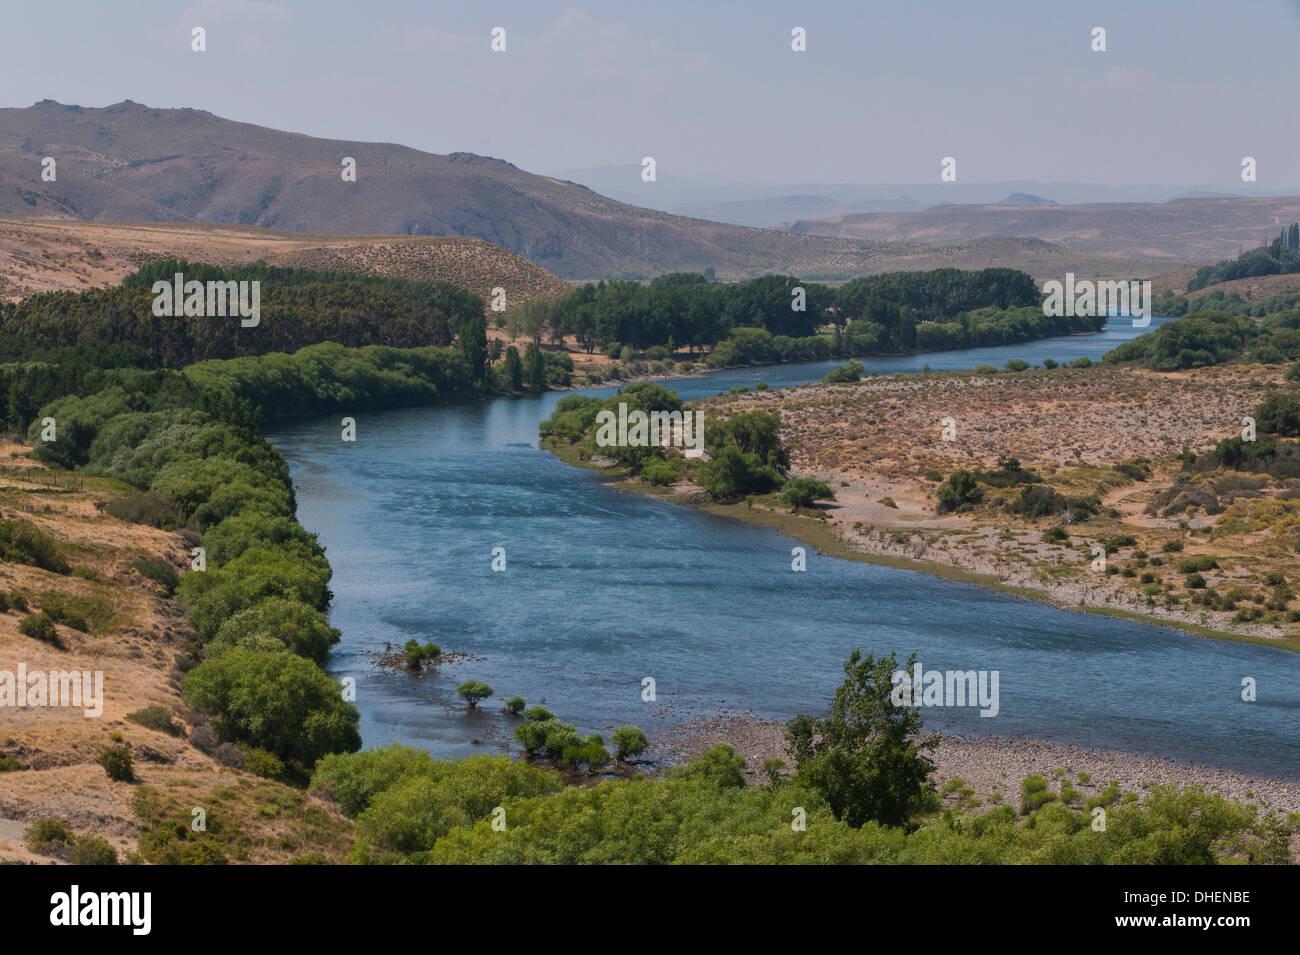 Rio Negro, Argentina - Stock Image